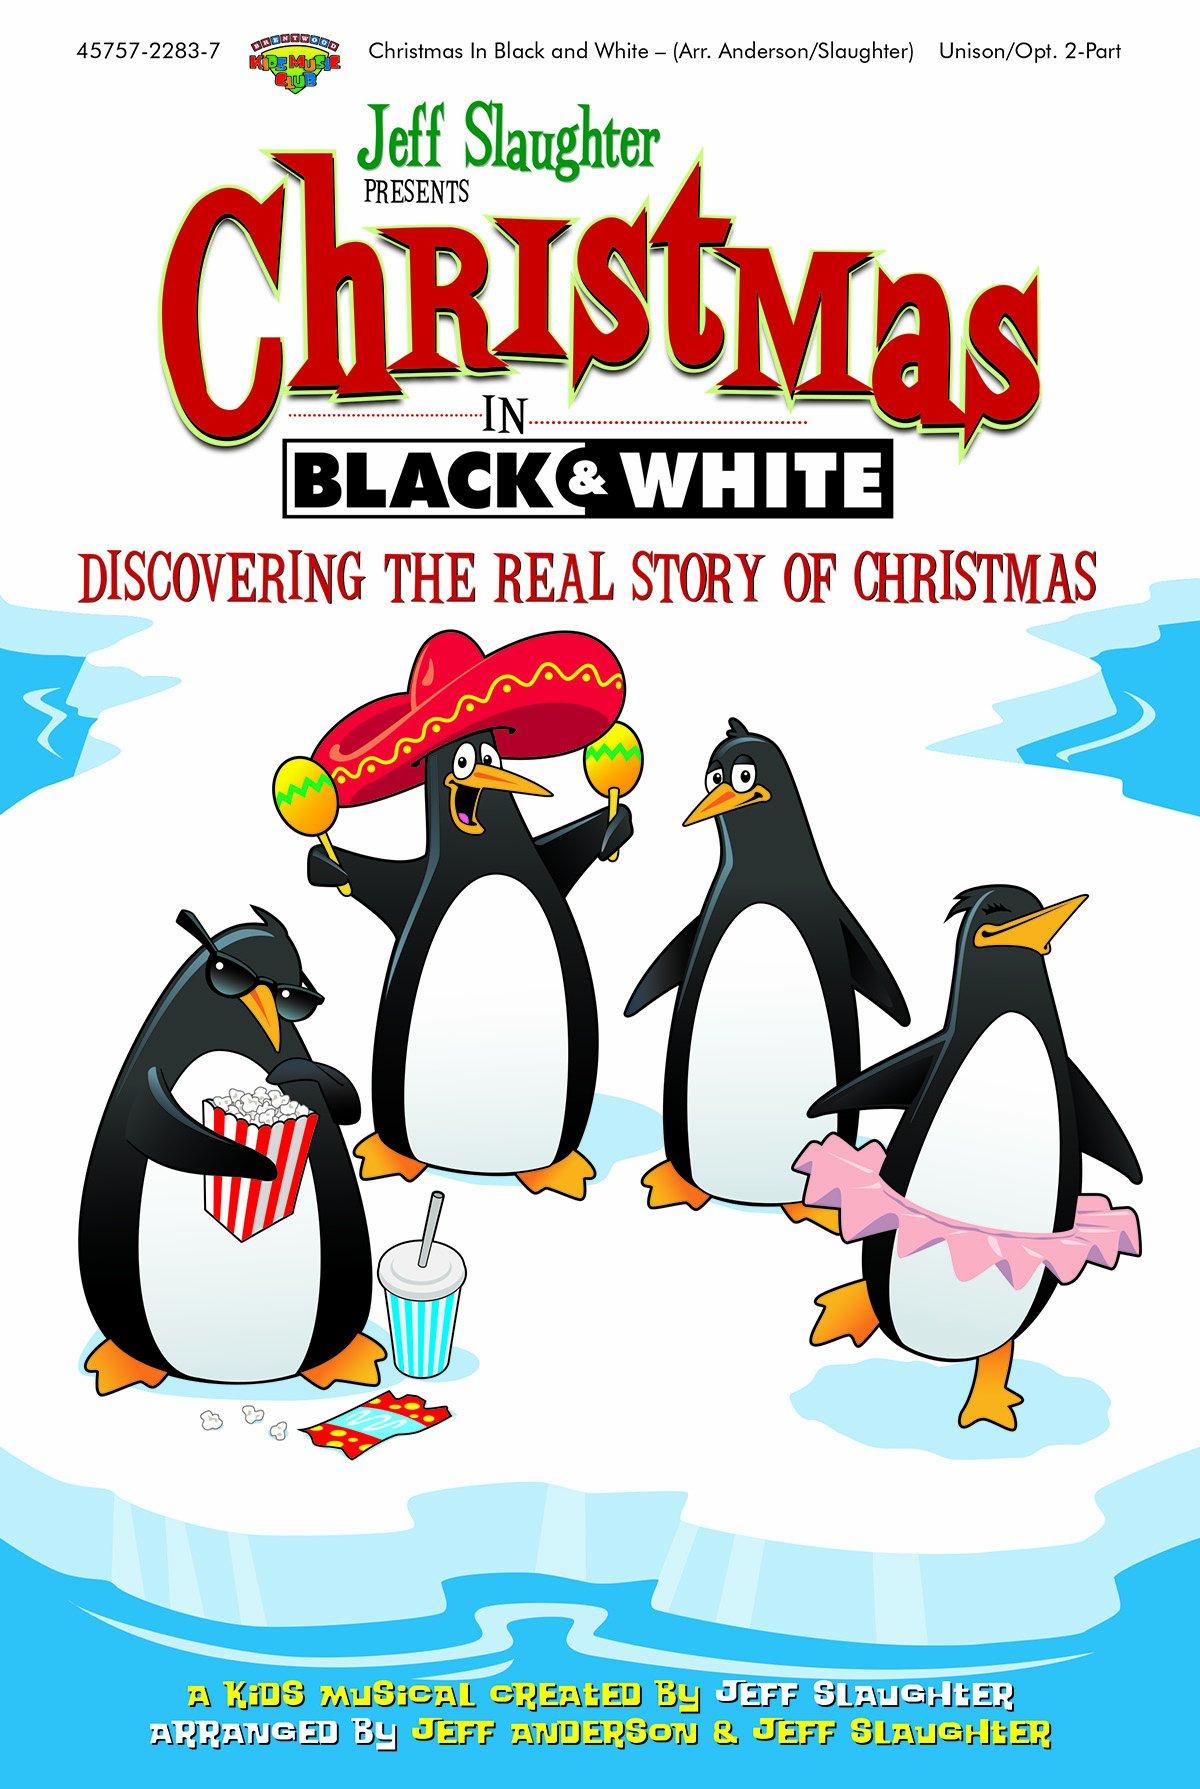 Christmas in Black and White (Split Track CD)